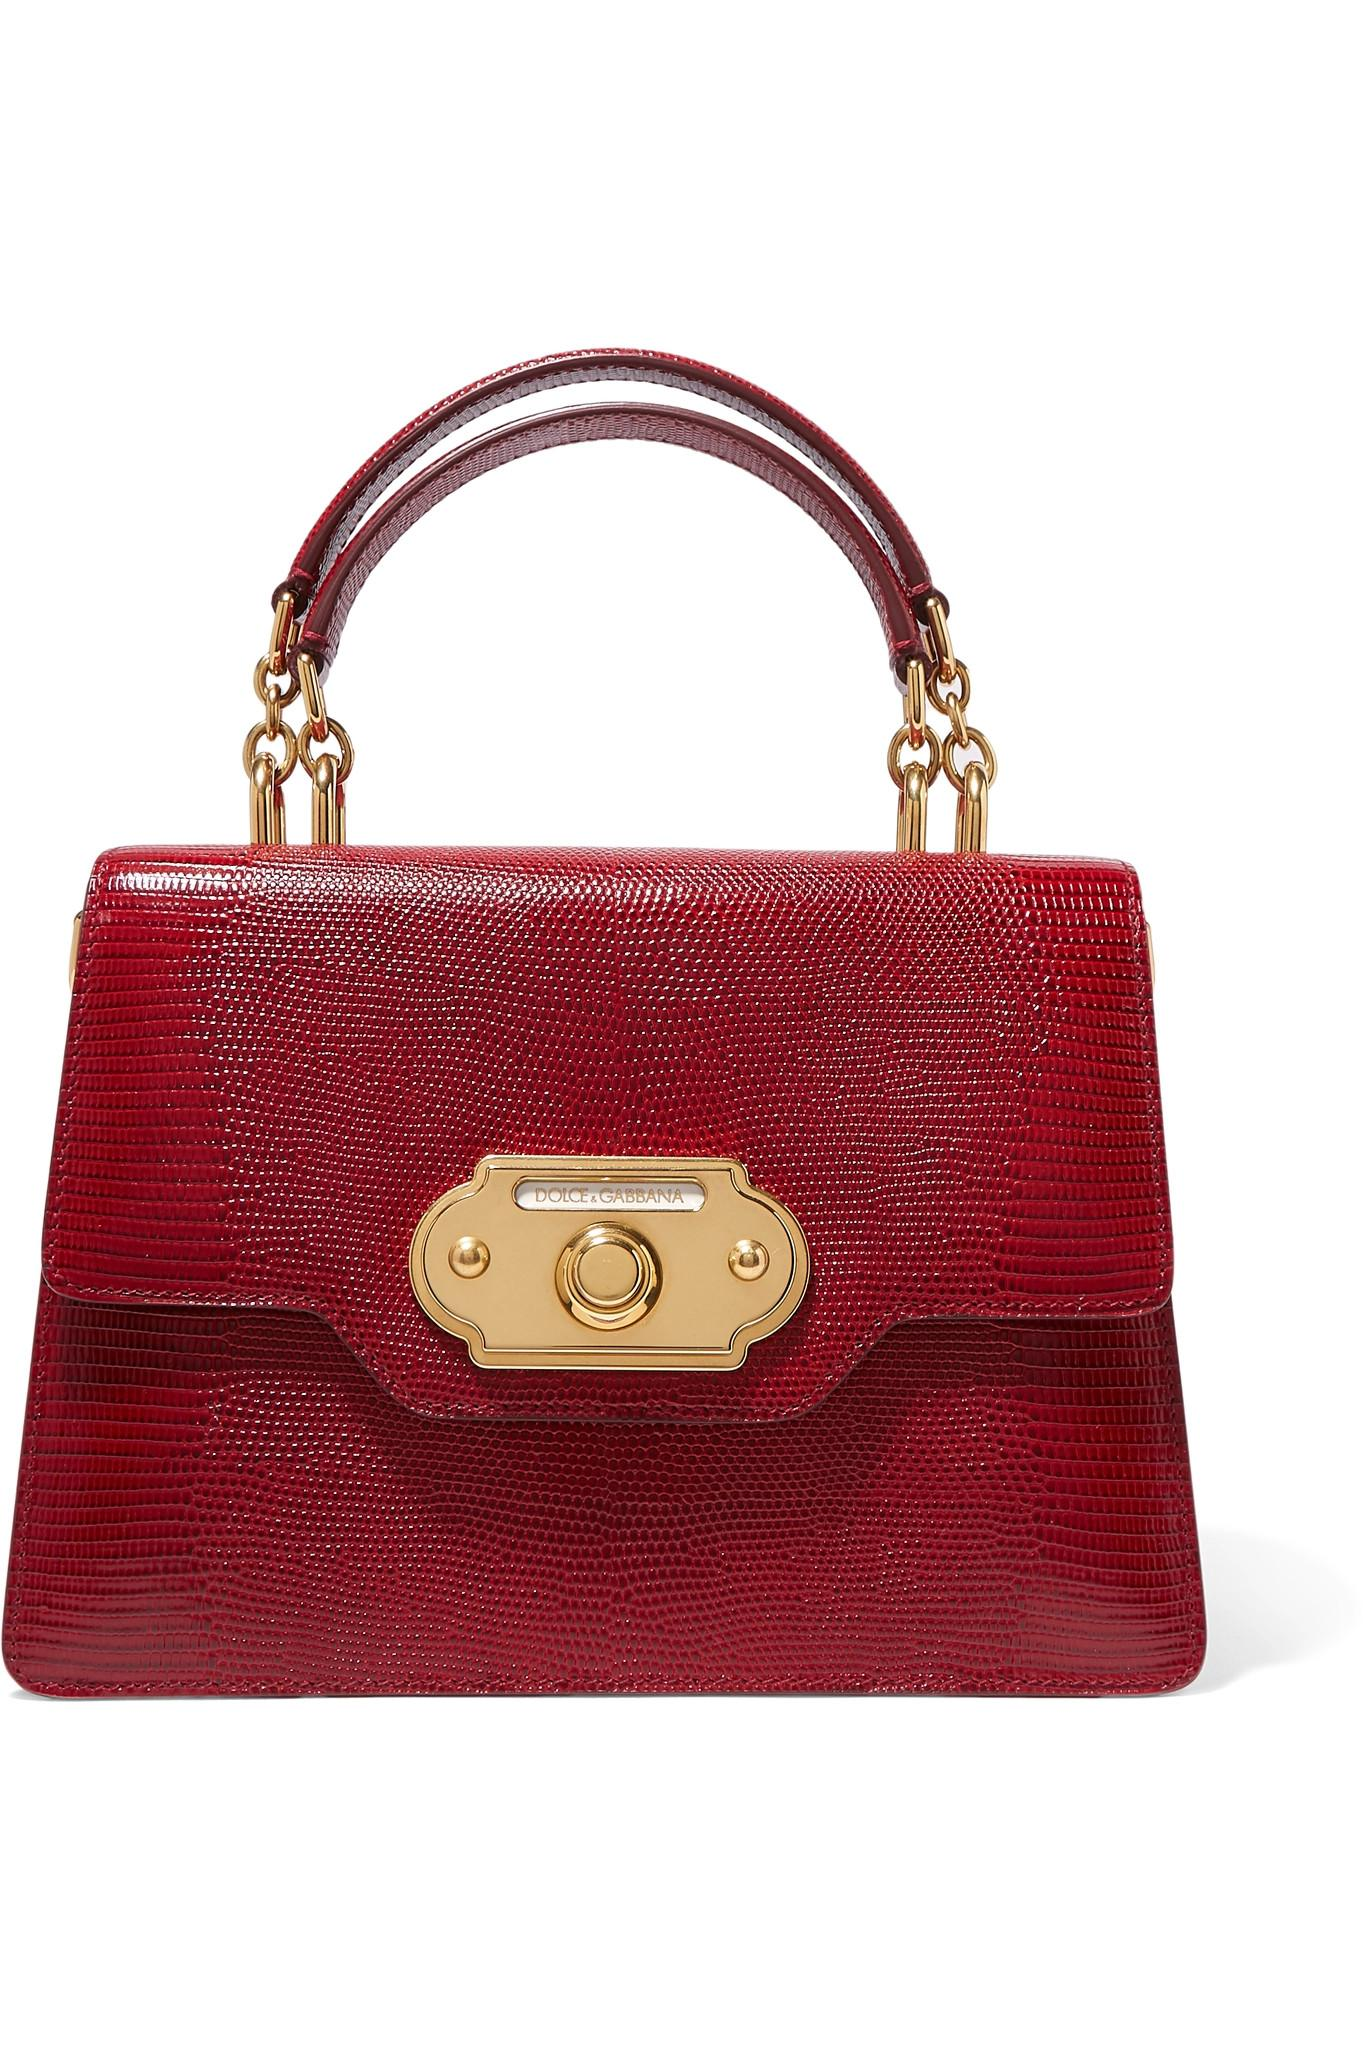 7fb5dbda857 Lyst - Dolce & Gabbana Welcome Medium Lizard-effect Leather Tote in Red